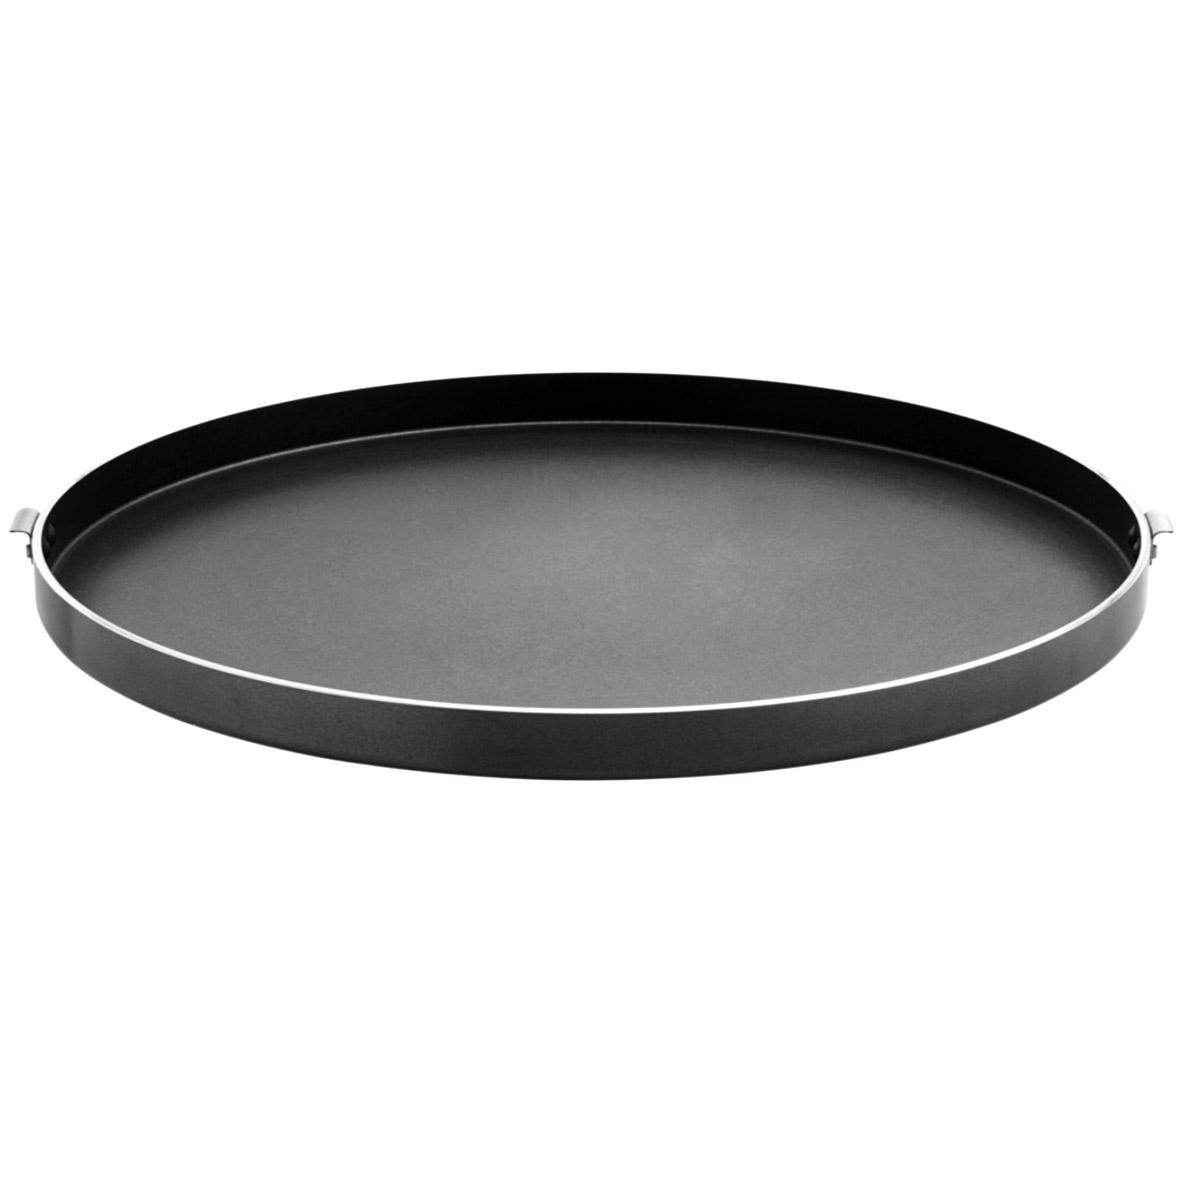 Cadac Wendegrillplatte Citi Chef 40 Grillo Chef Grillplatte Grill Platte Rost